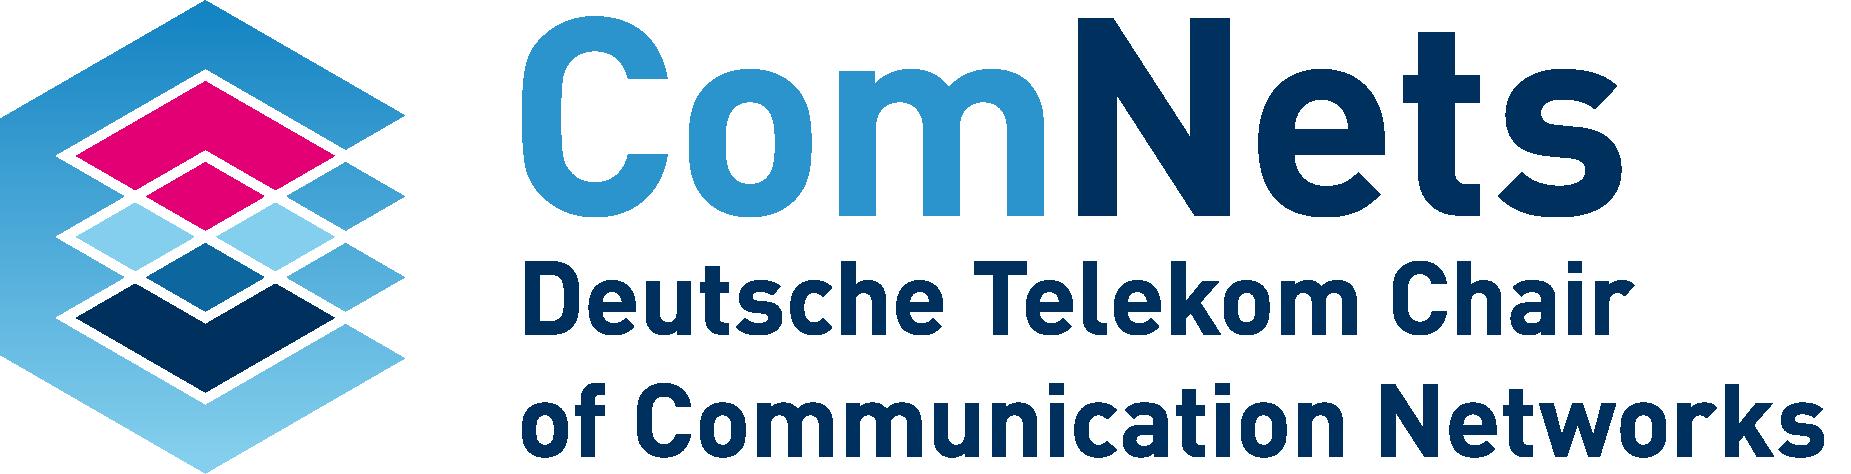 comnets logo